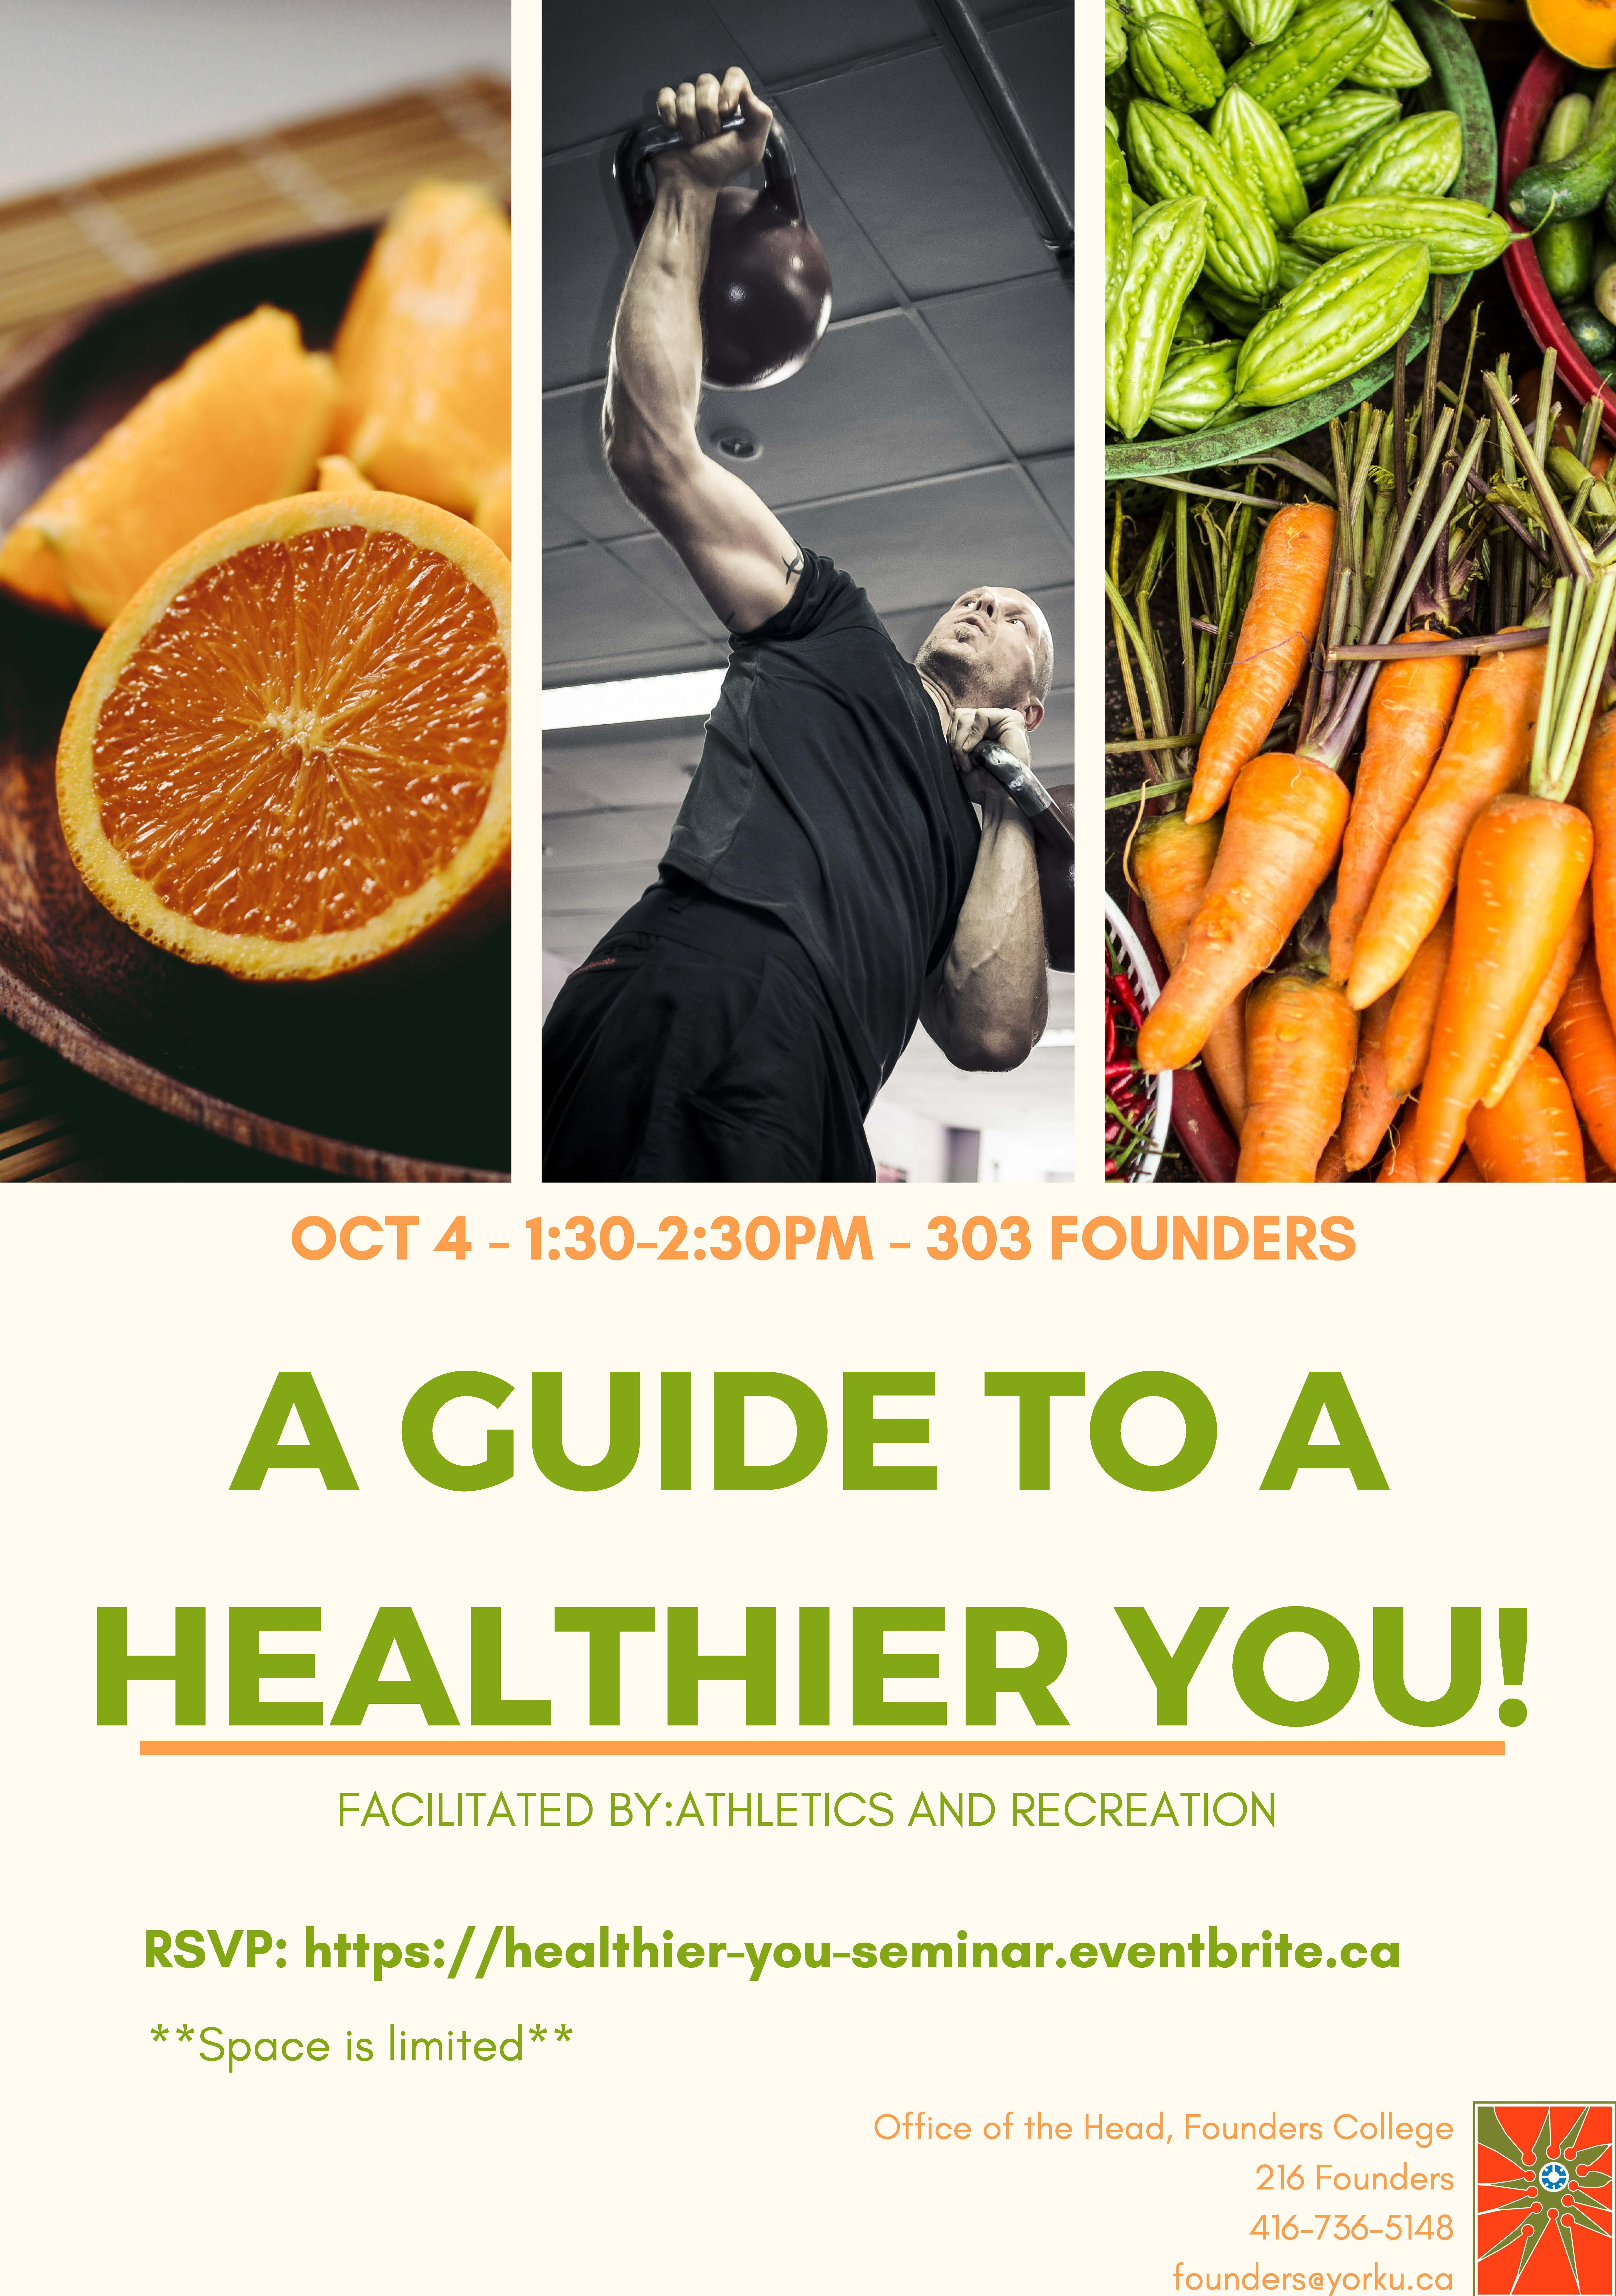 A Guide to a Healthier You